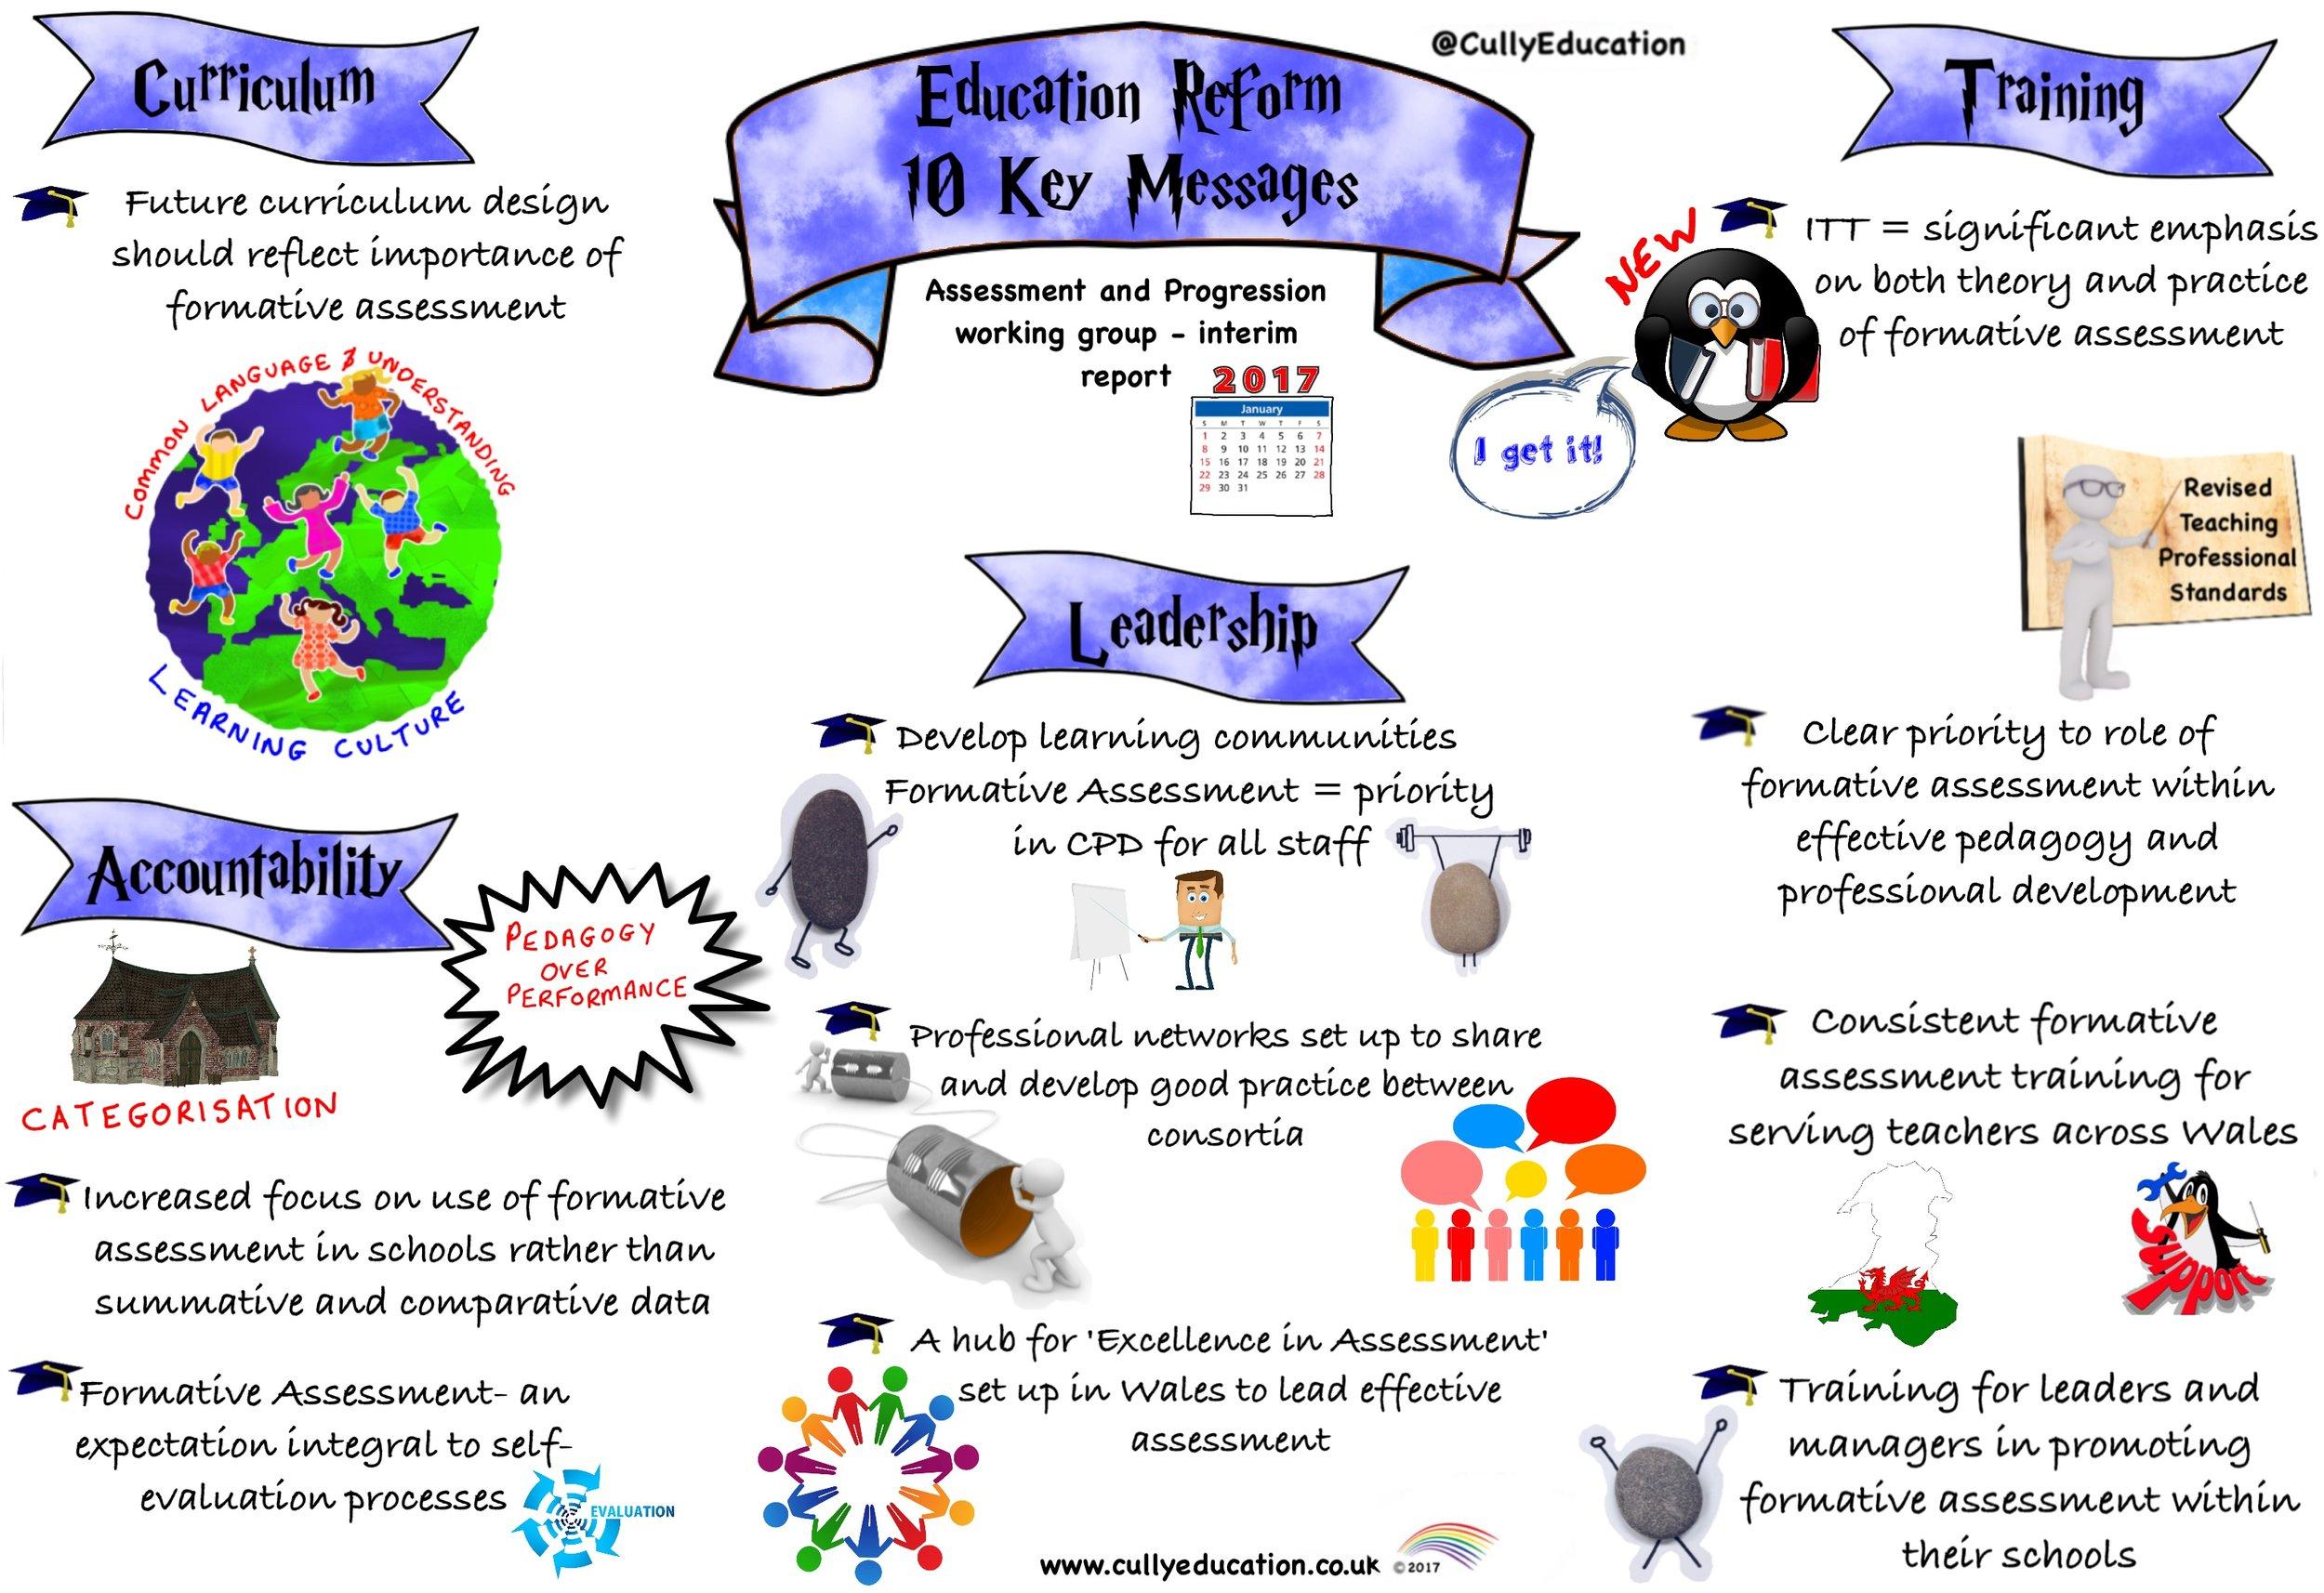 Education Reform - 10 Key Messages